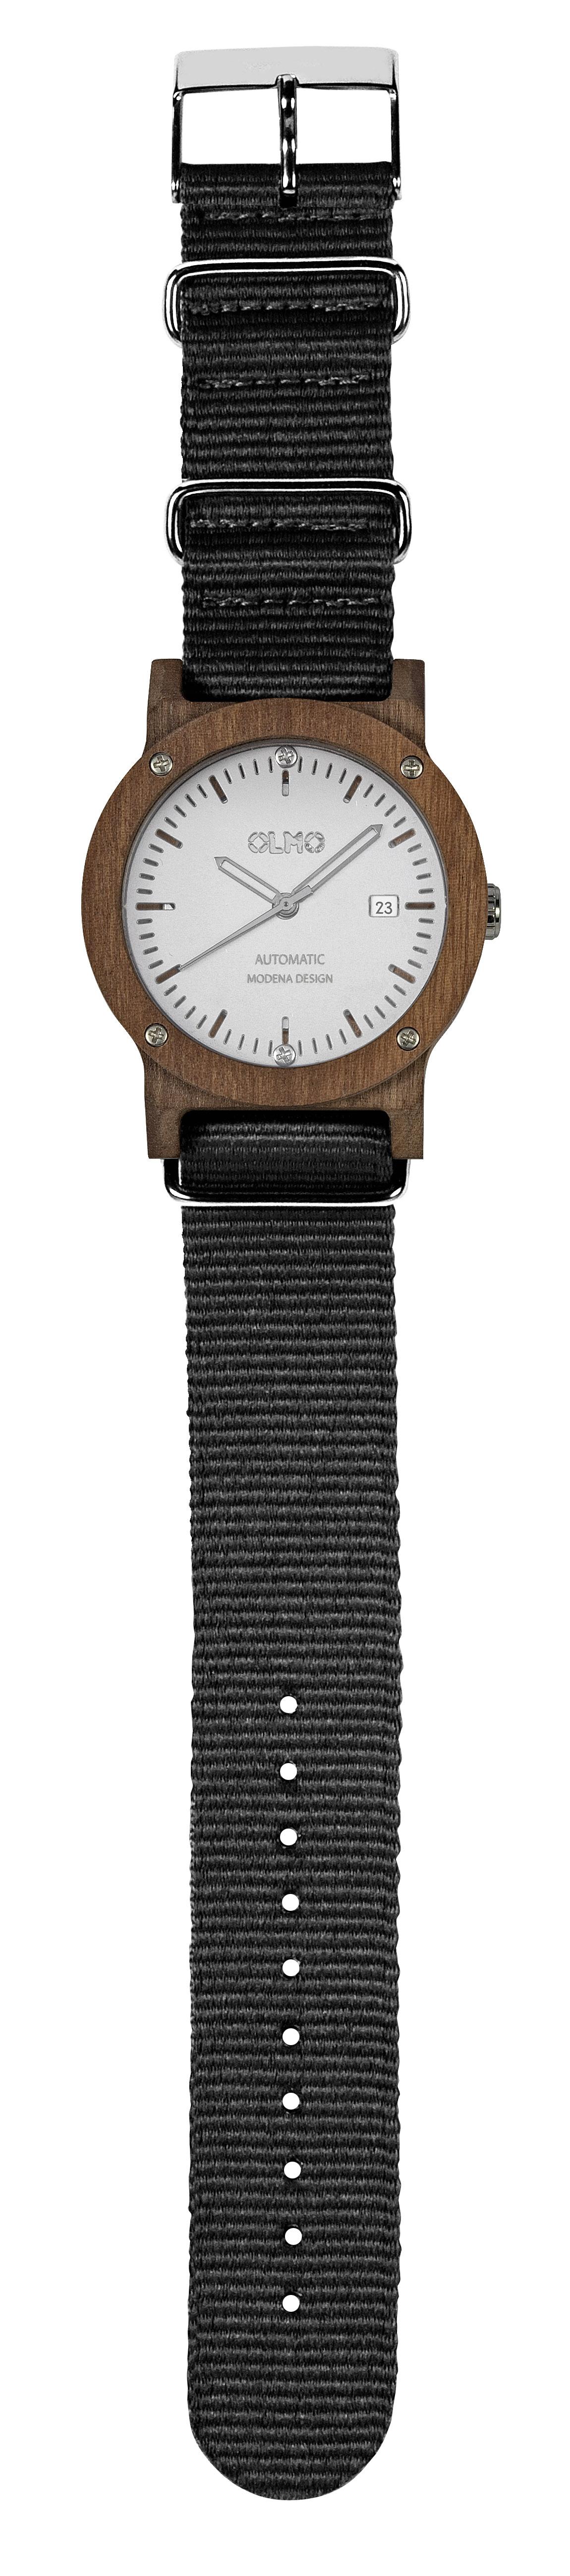 OLMO watch in mahogany